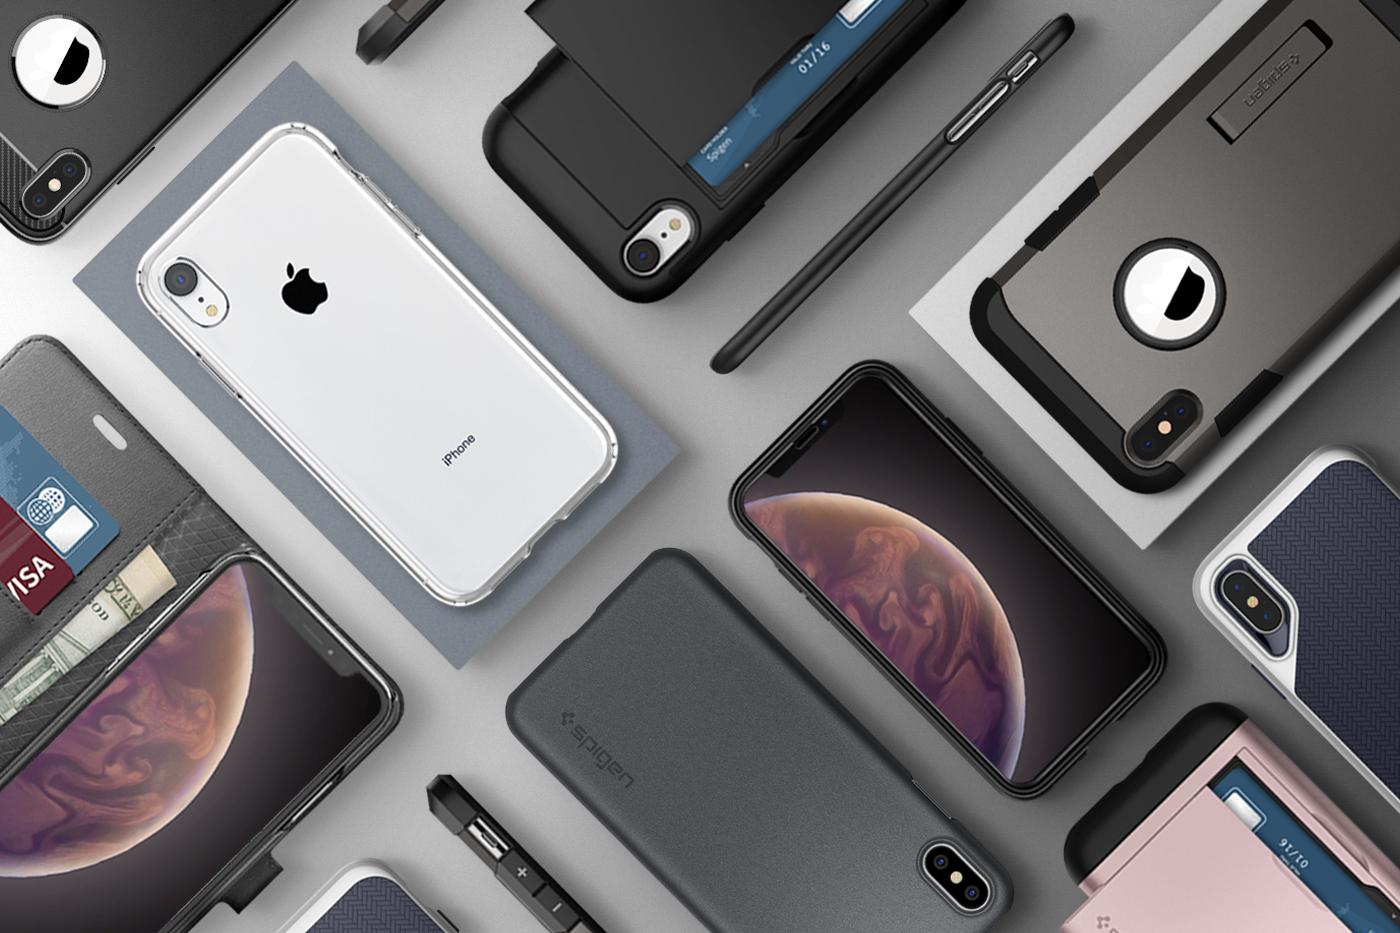 Spigen's popular case line arrives for iPhone XS, XS Max, & XR